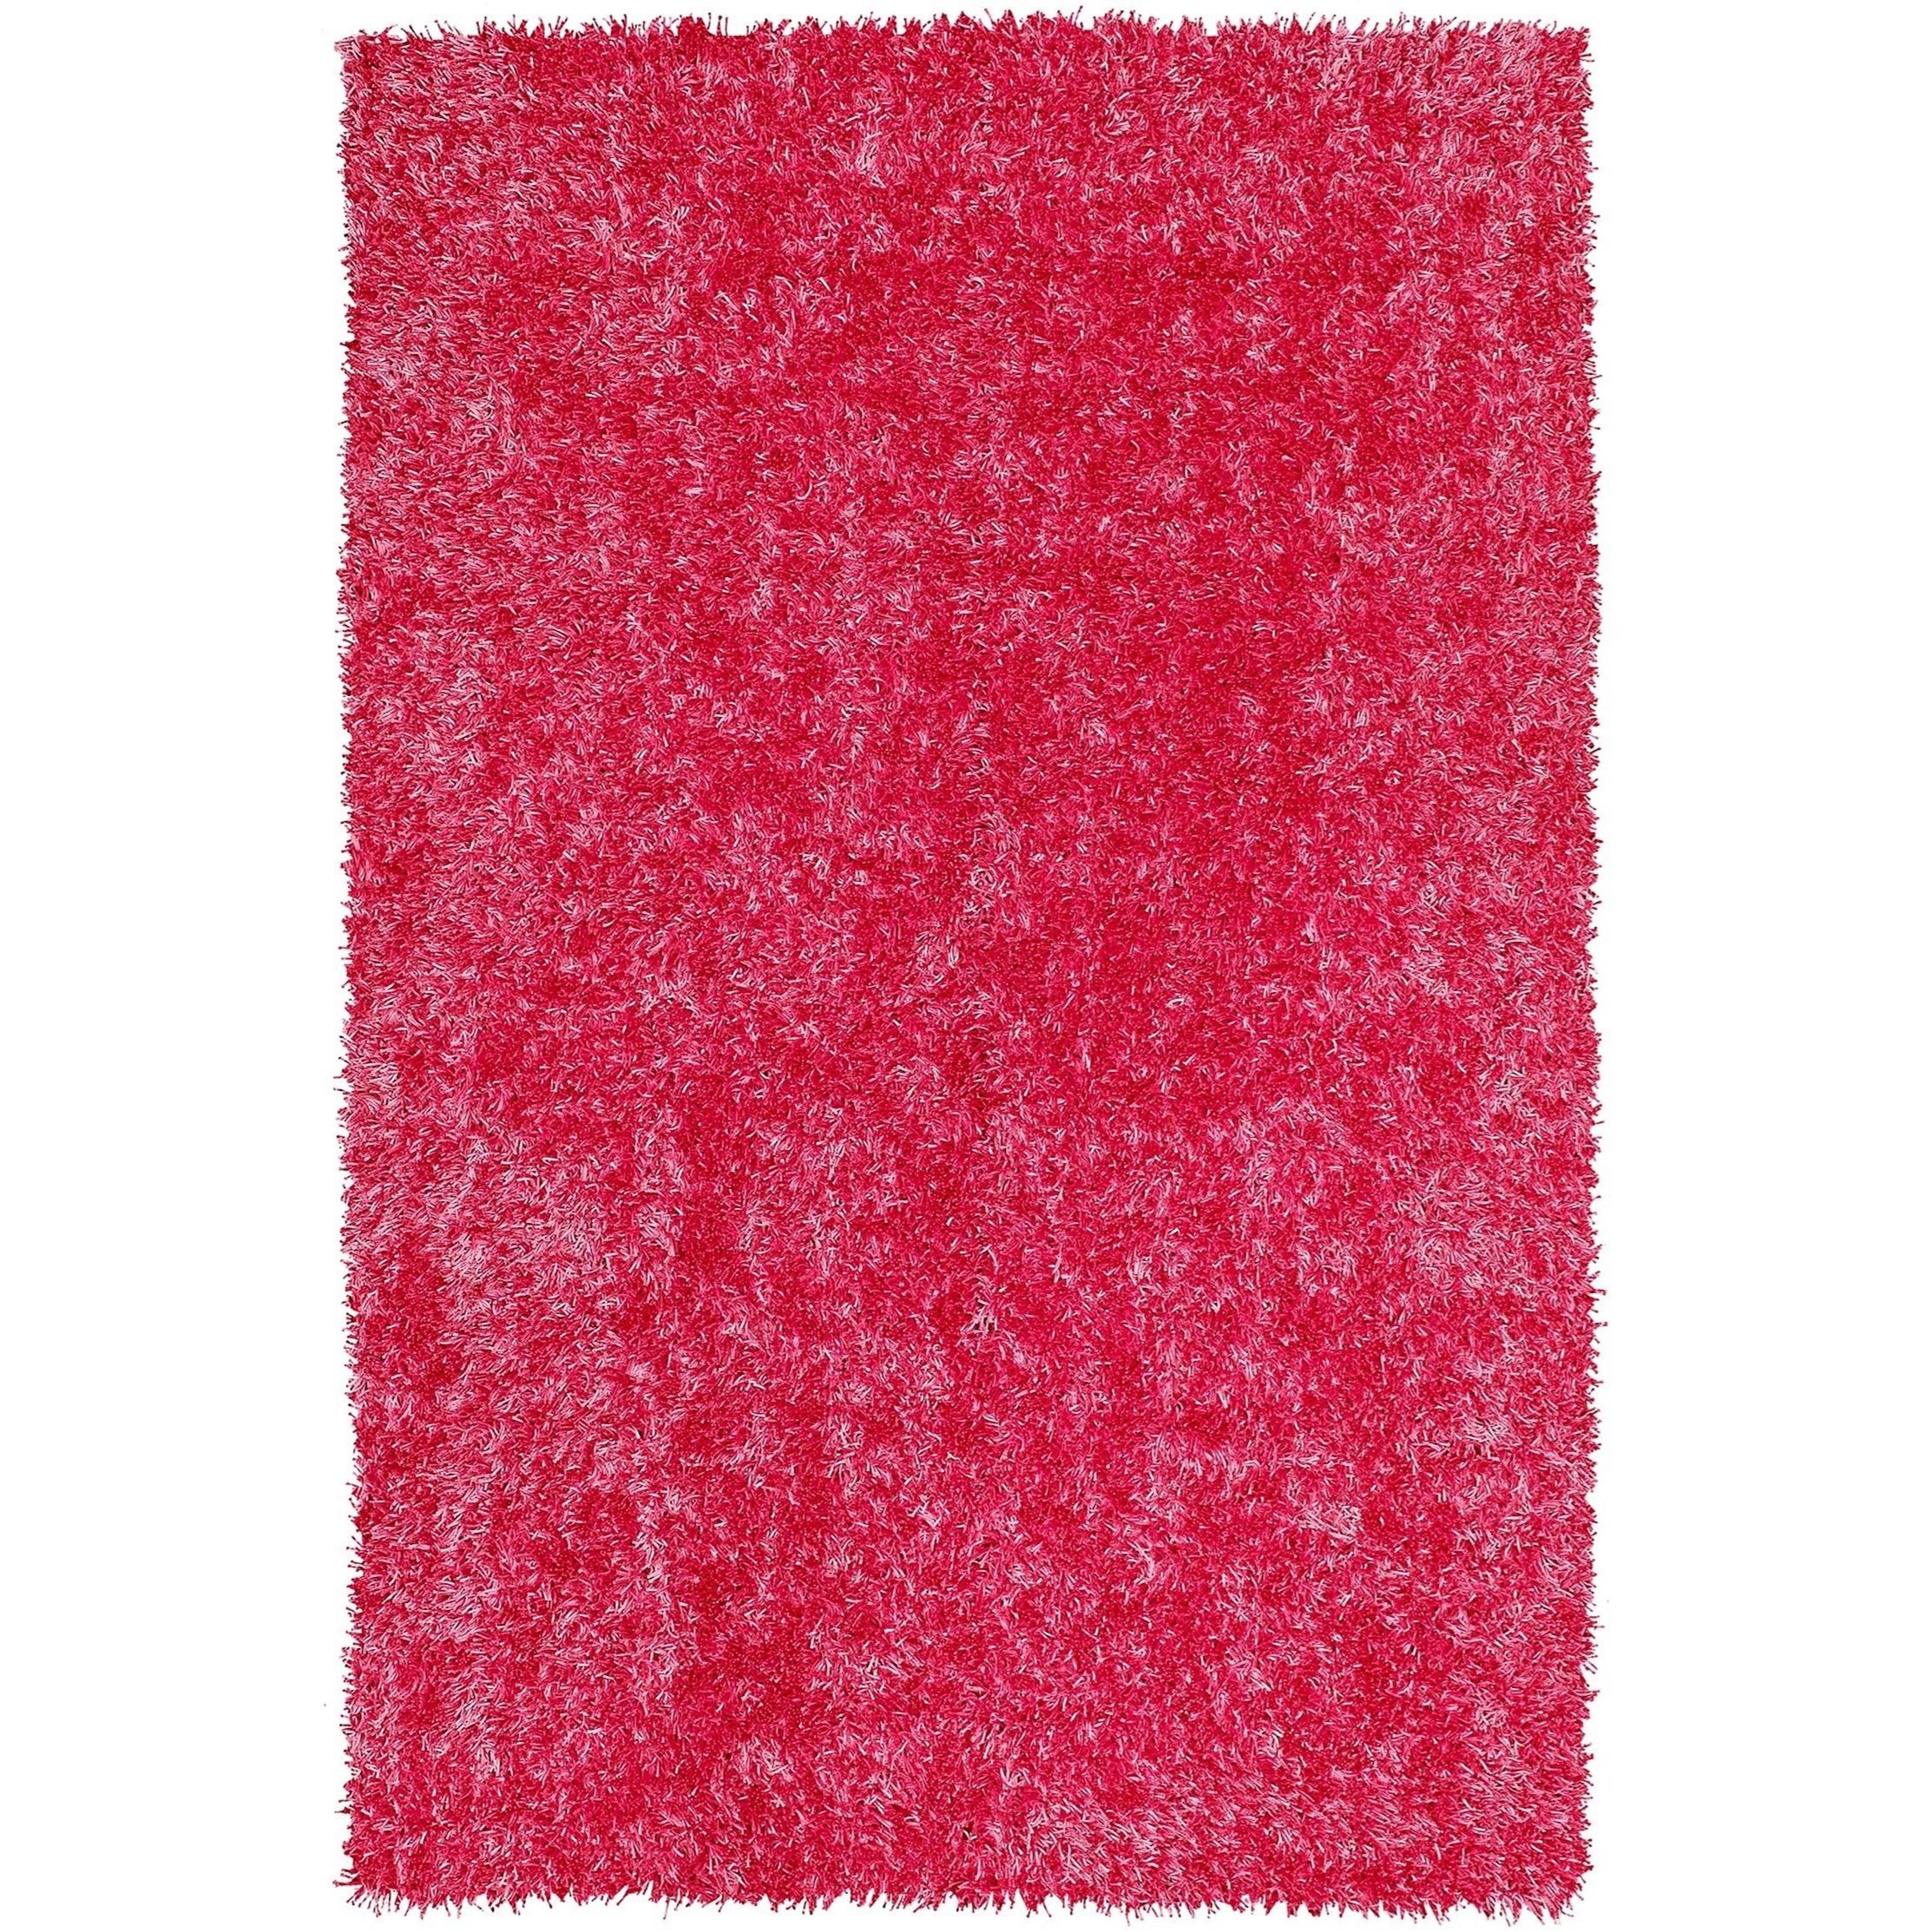 "Dalyn Bright Lights Hot Pink 3'6""X5'6"" Rug - Item Number: BG69HP4X6"